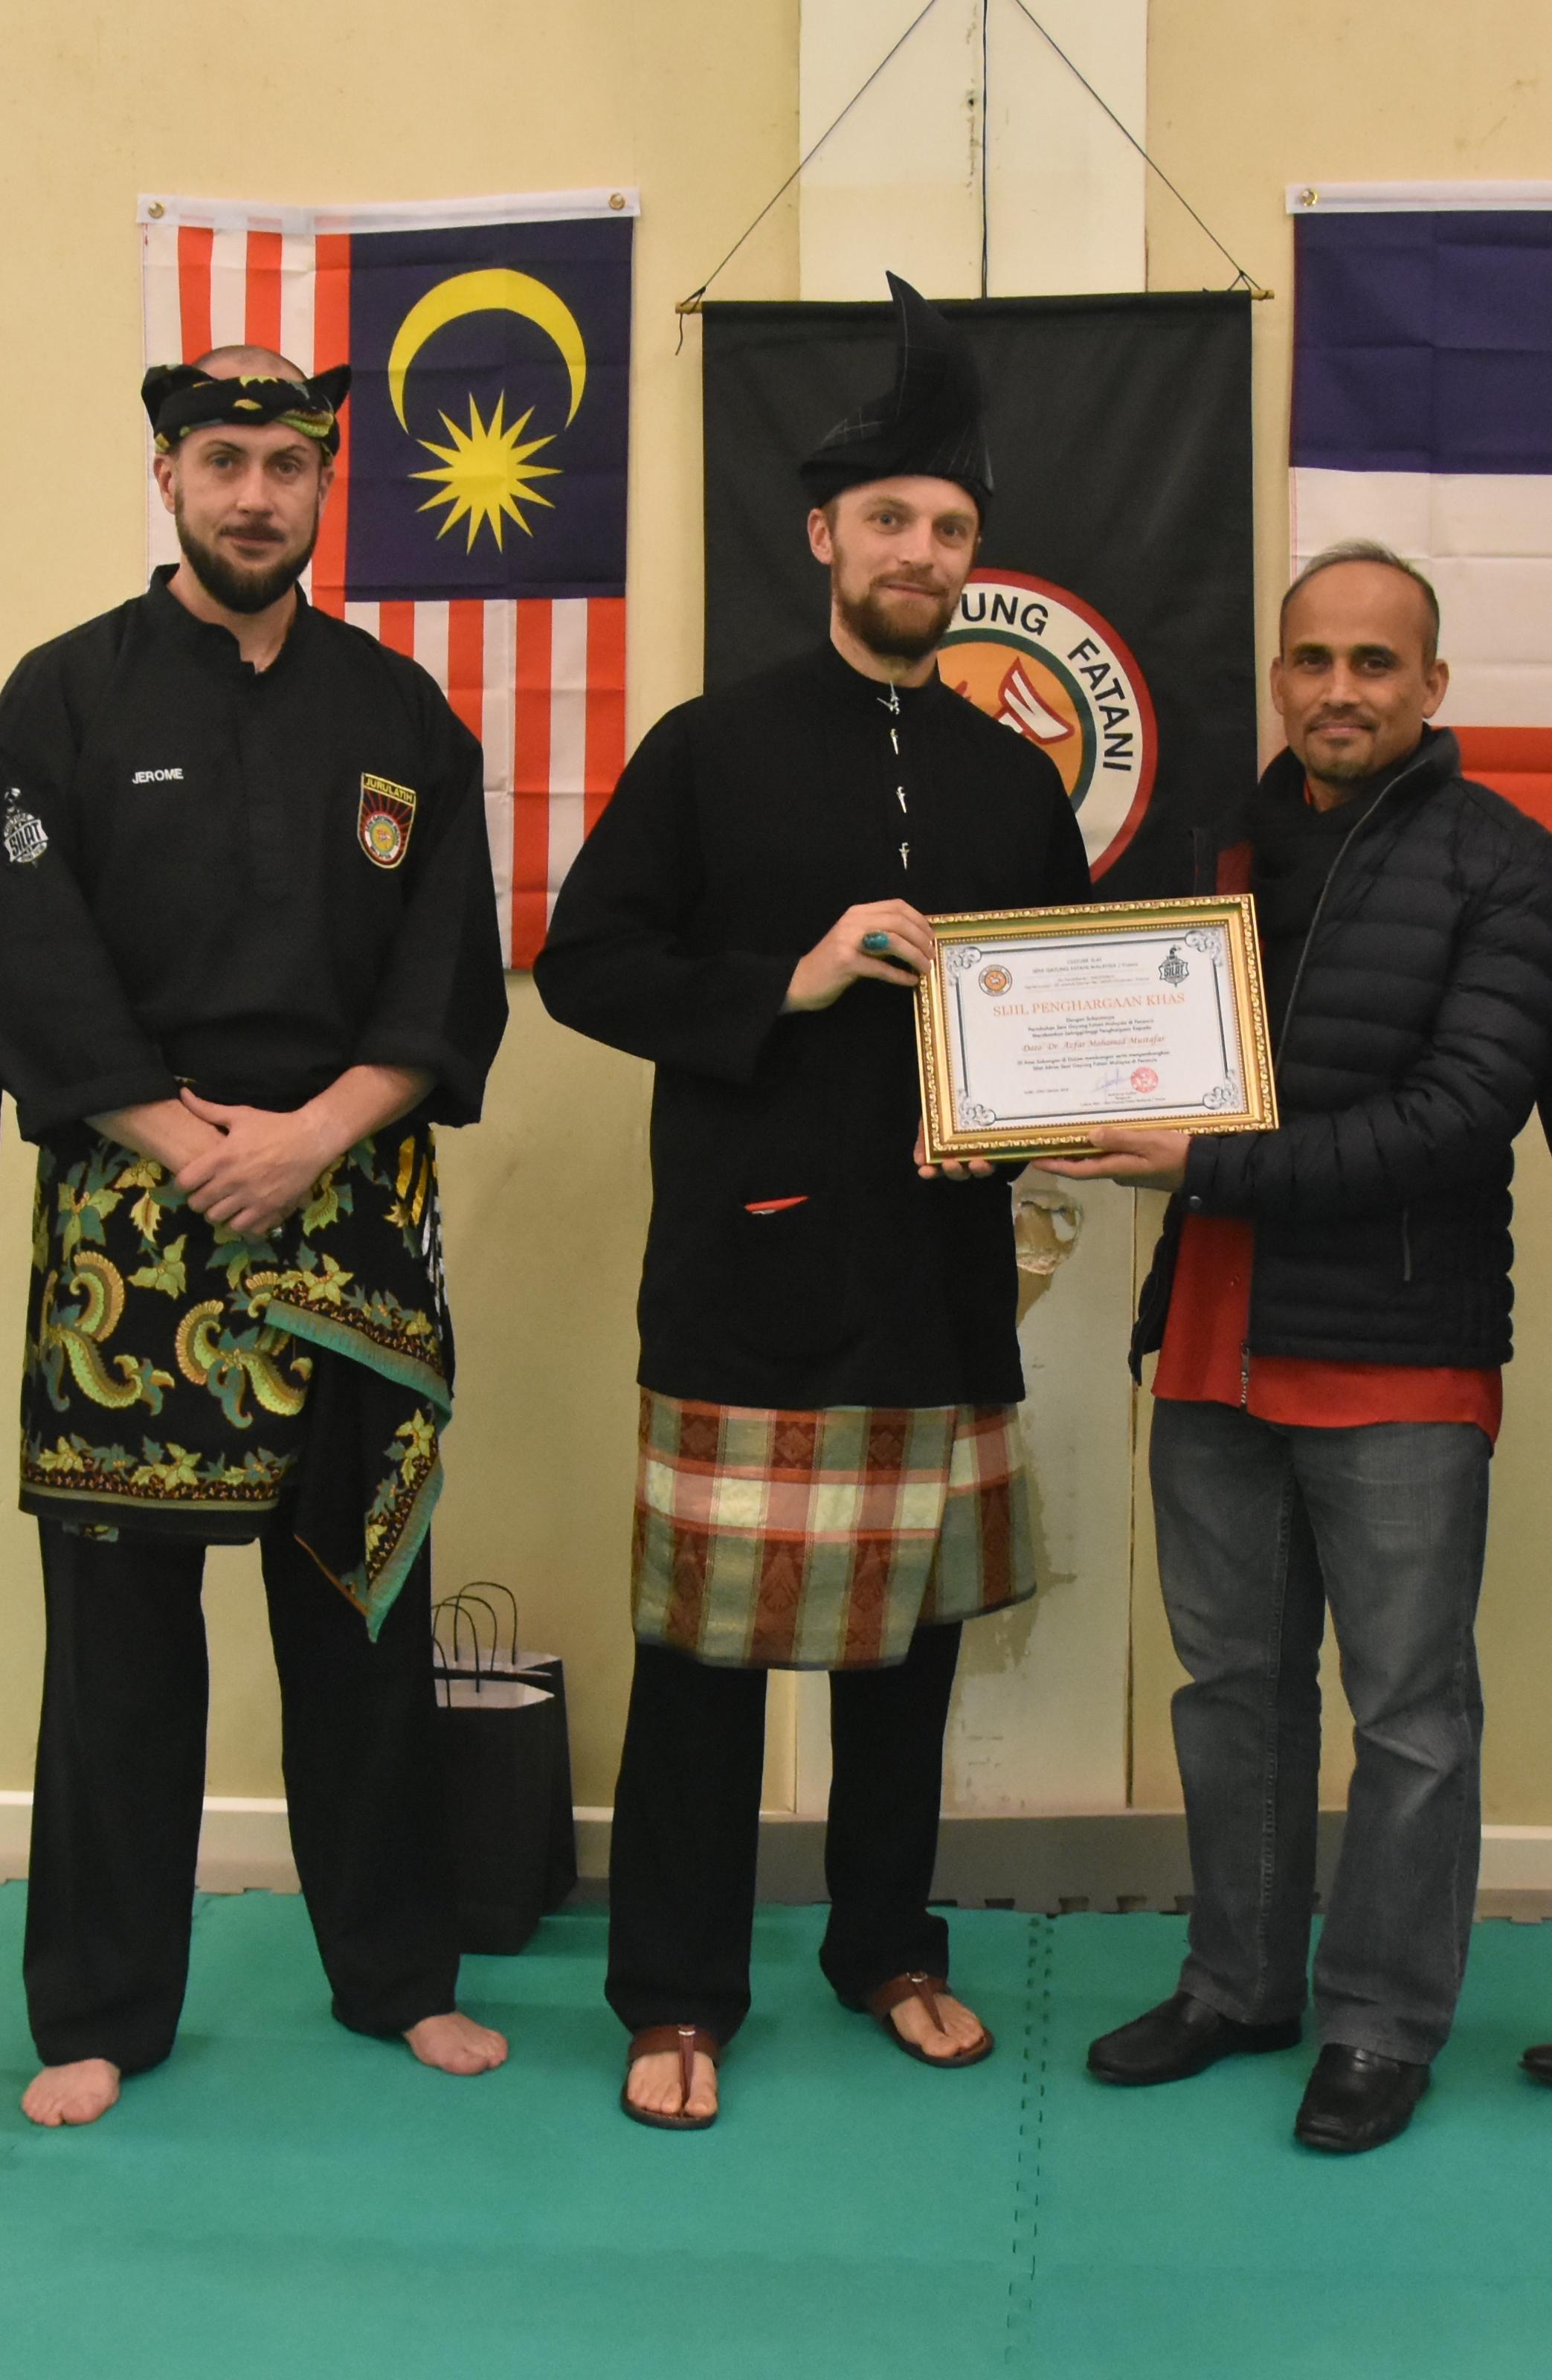 Culture Silat - Cikgu Audy remet un Diplôme a SE Dato' Azfar